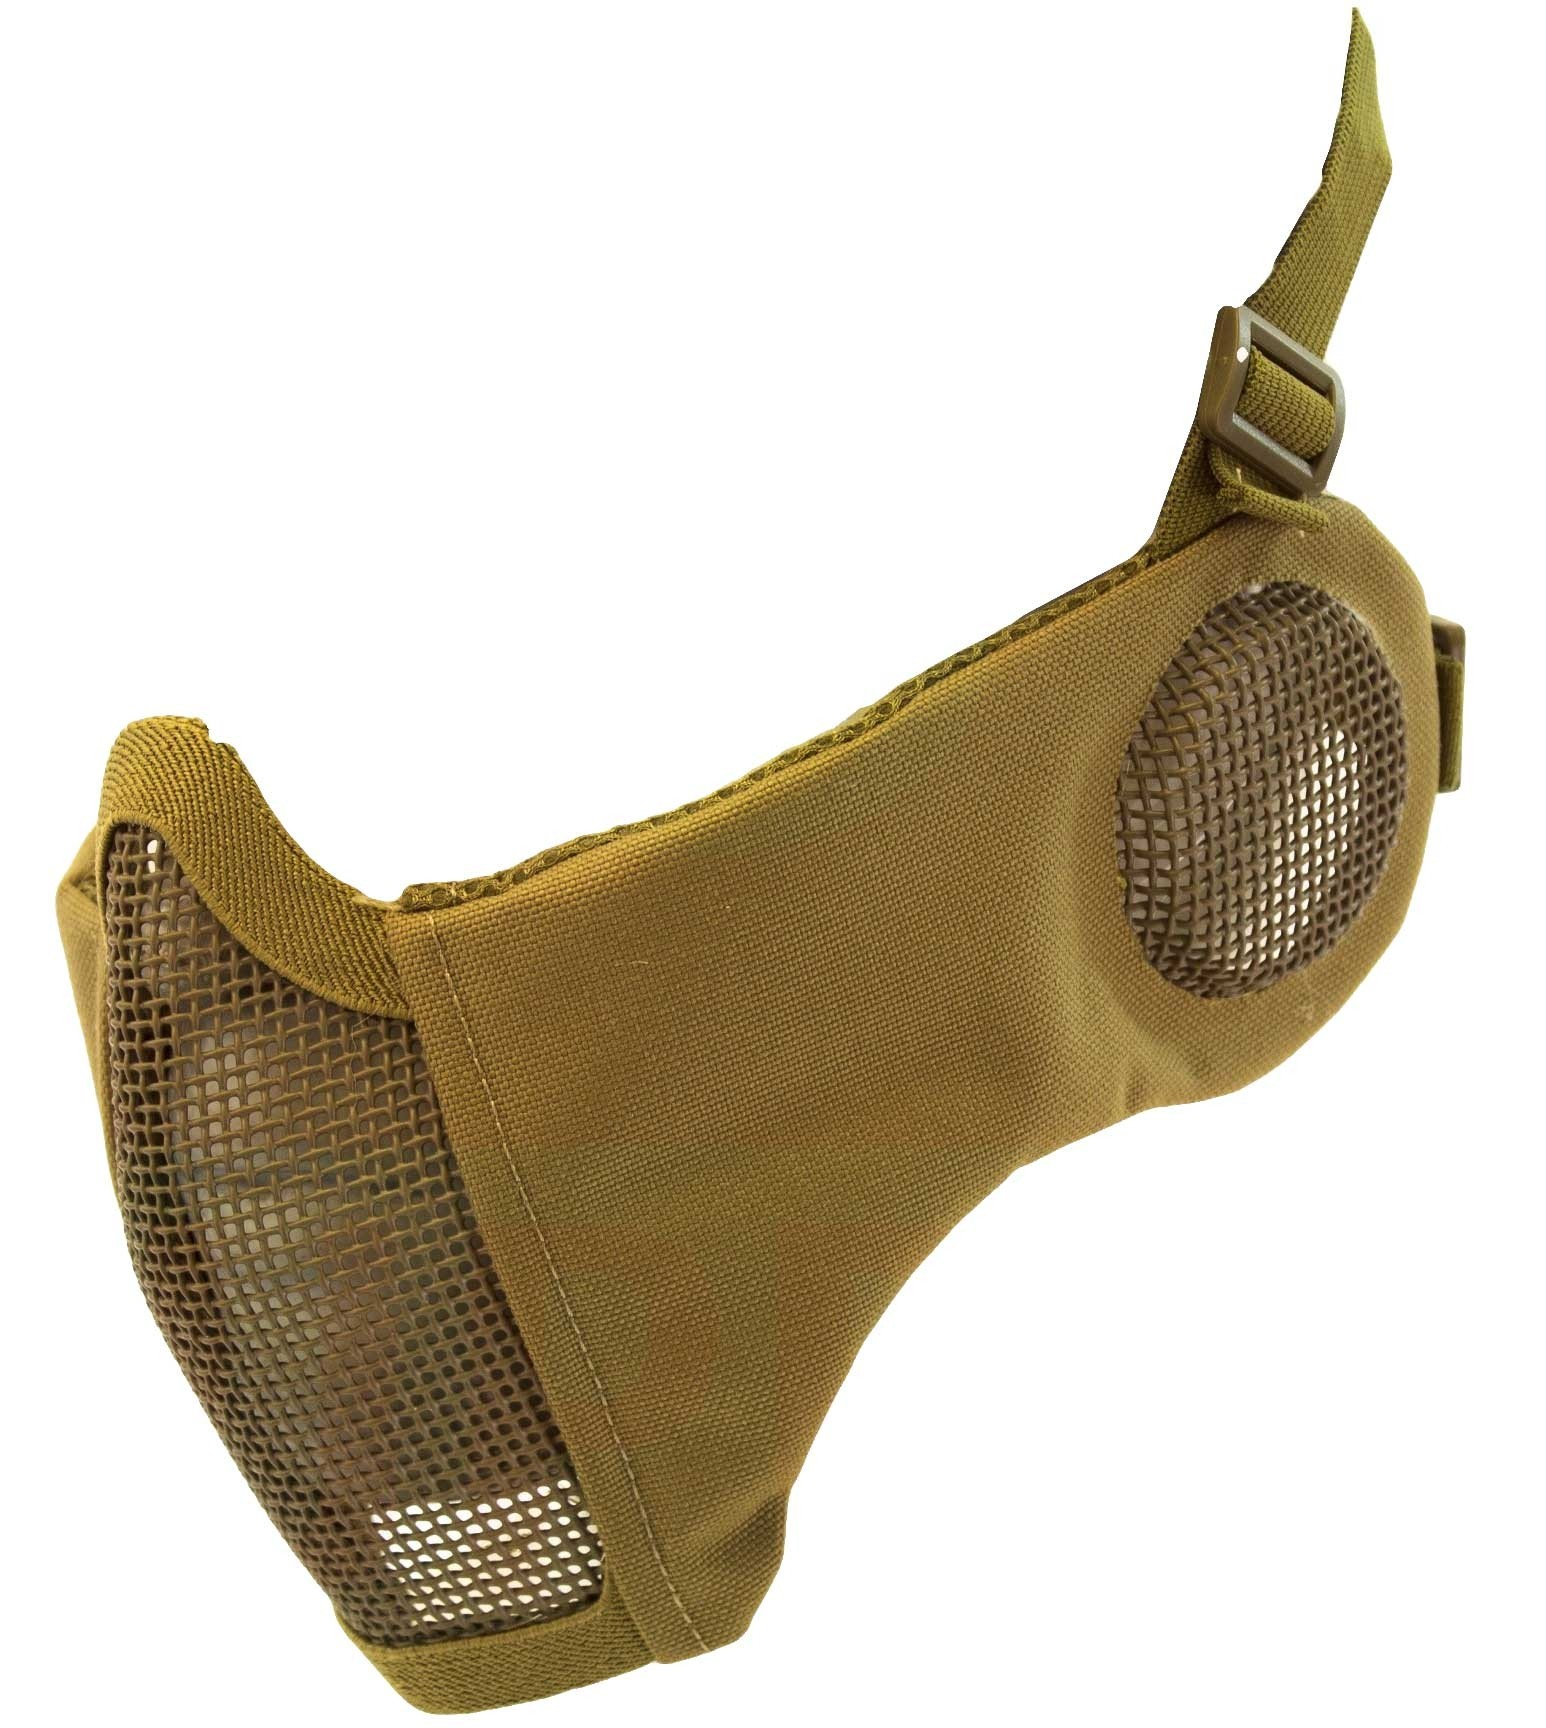 Nuprol Airsoft Mesh Lower Face Shield V3 - Tan